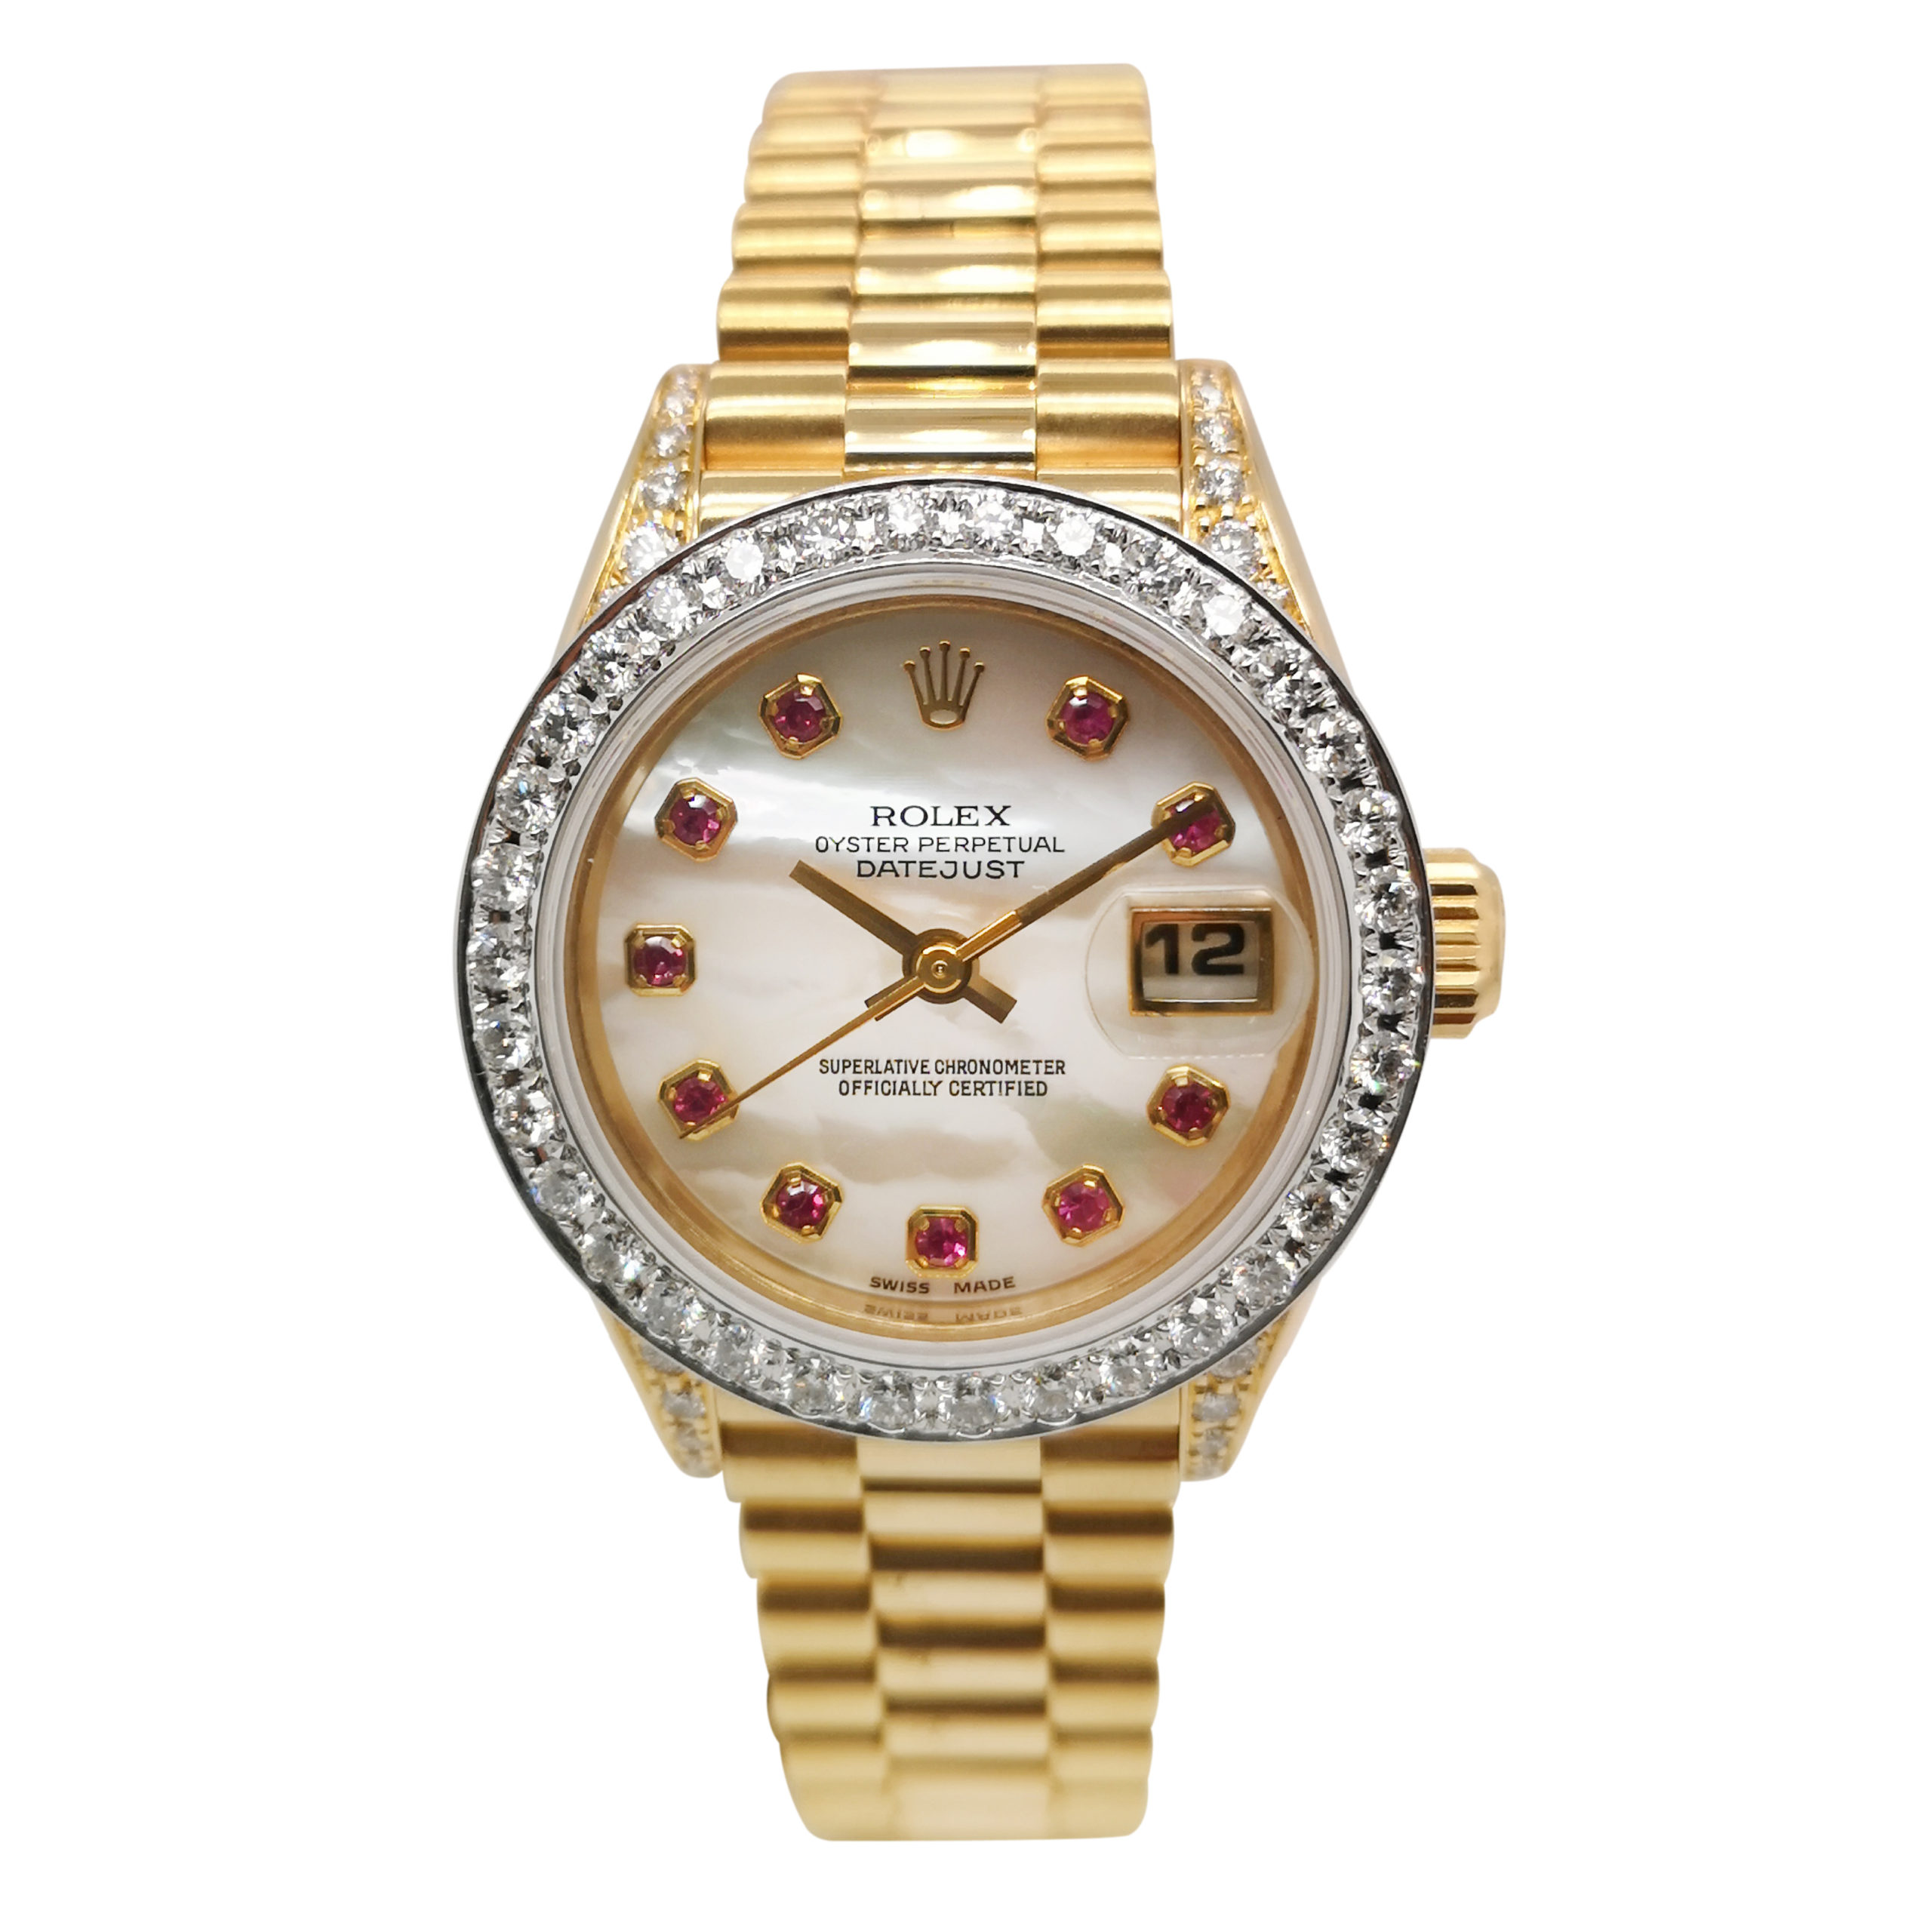 Rolex Datejust Ruby MOP 69238 Watch